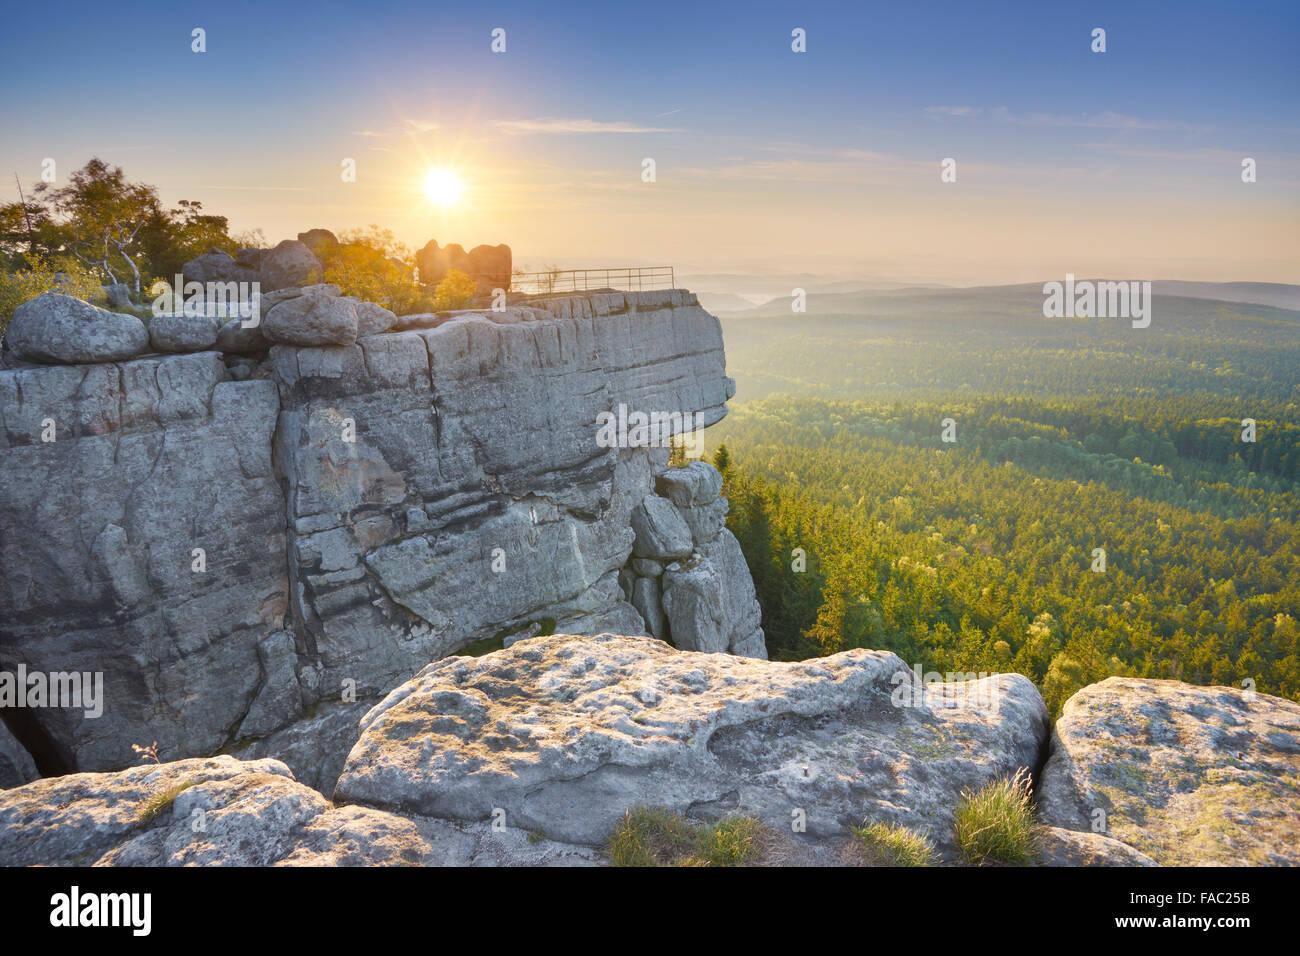 Szczeliniec Wielki National Park at sunset - Table Mountains, Poland - Stock Image